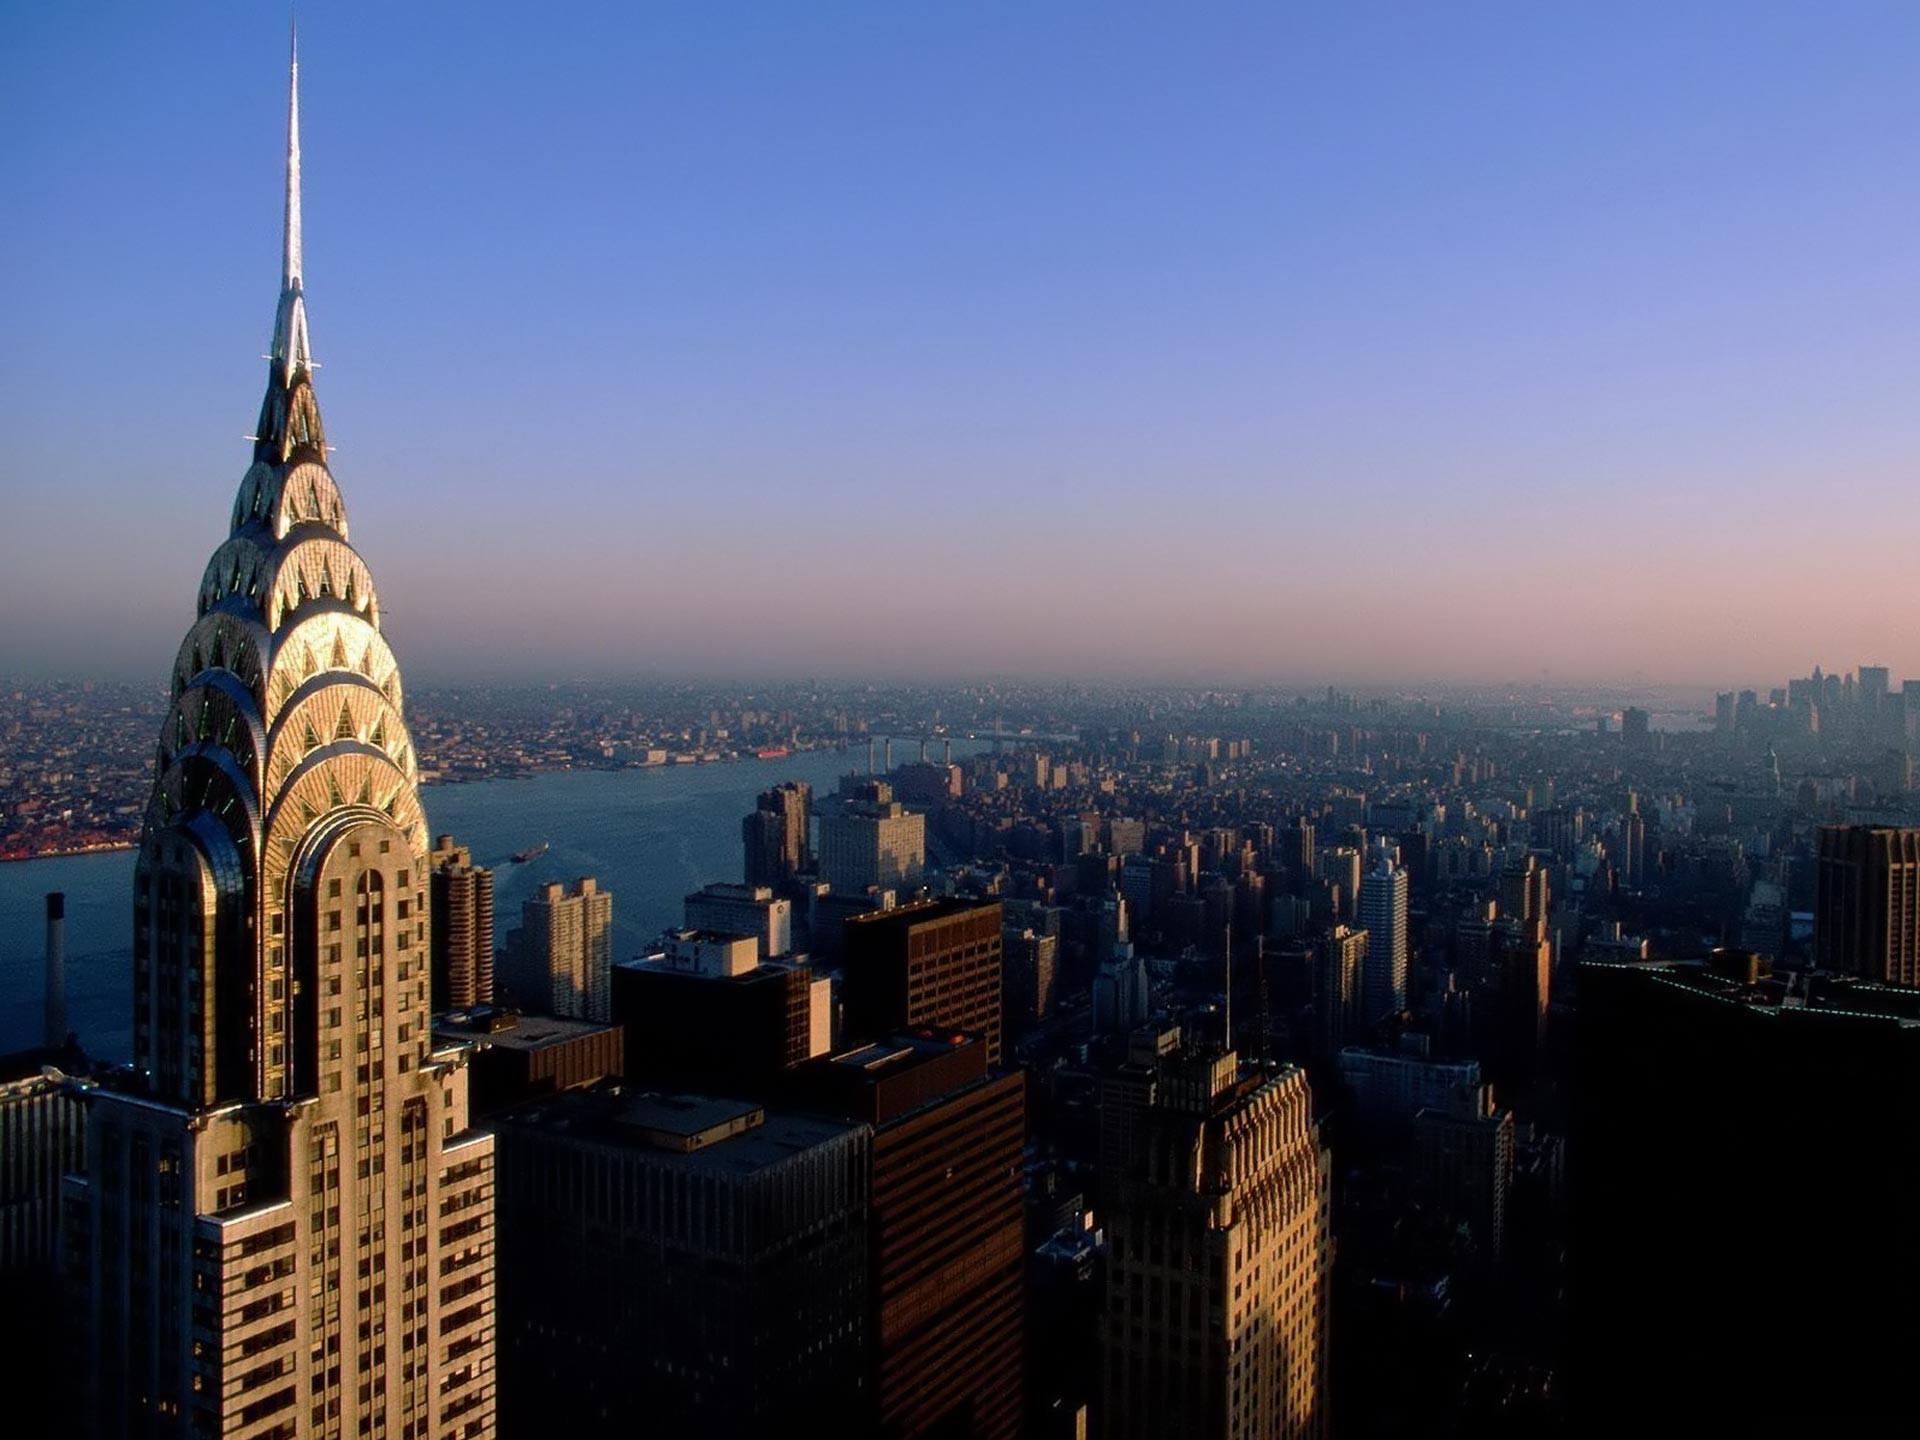 Chrysler Building NYC New York City Skyline Cityscape America Travel Print  Poster Gift